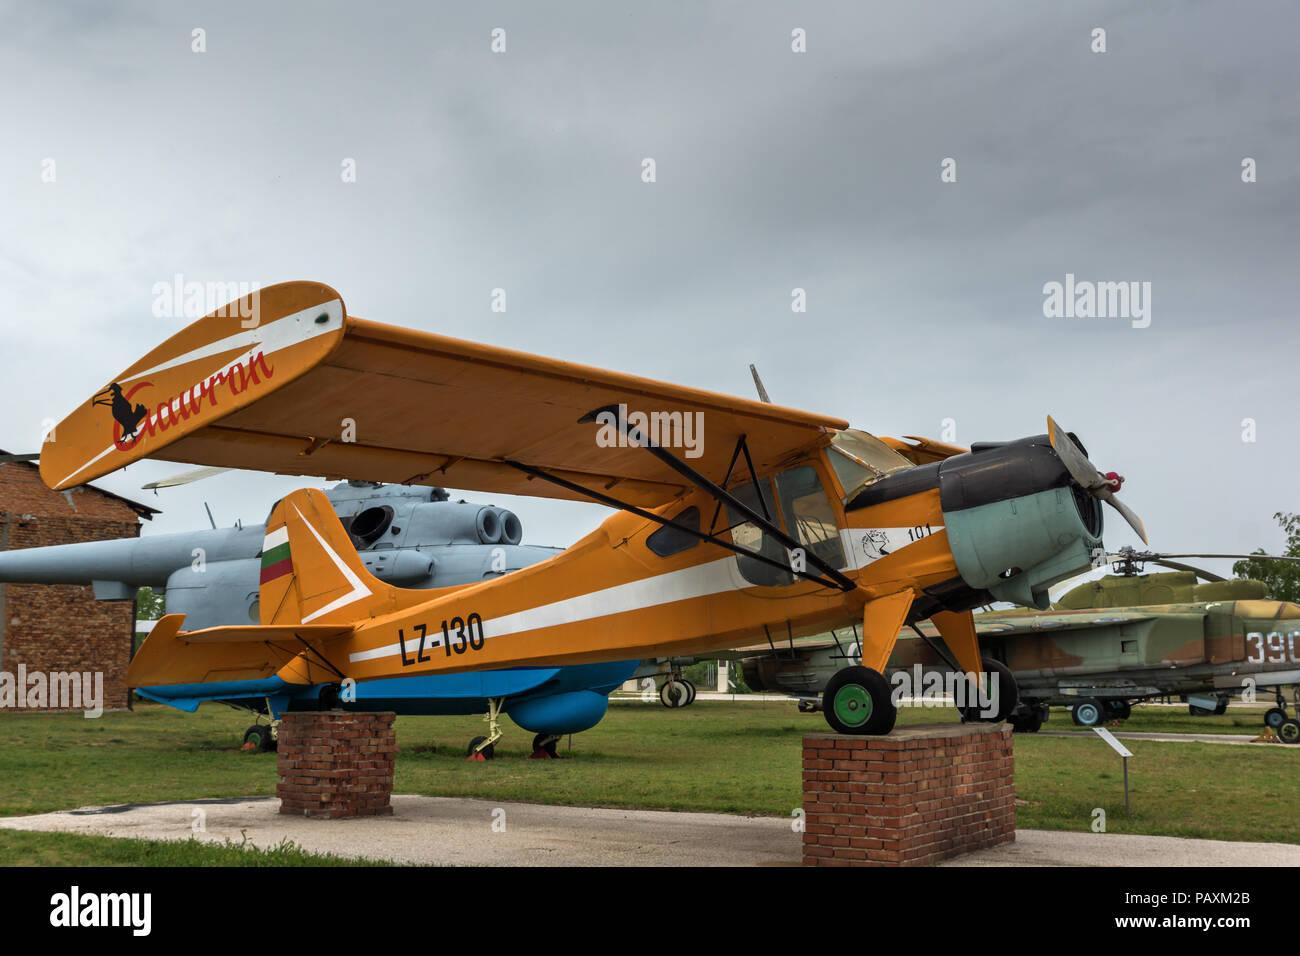 KRUMOVO, PLOVDIV, BULGARIA - 29 APRIL 2017: Plane LZ - 130 in Aviation Museum near Plovdiv Airport, Bulgaria Stock Photo